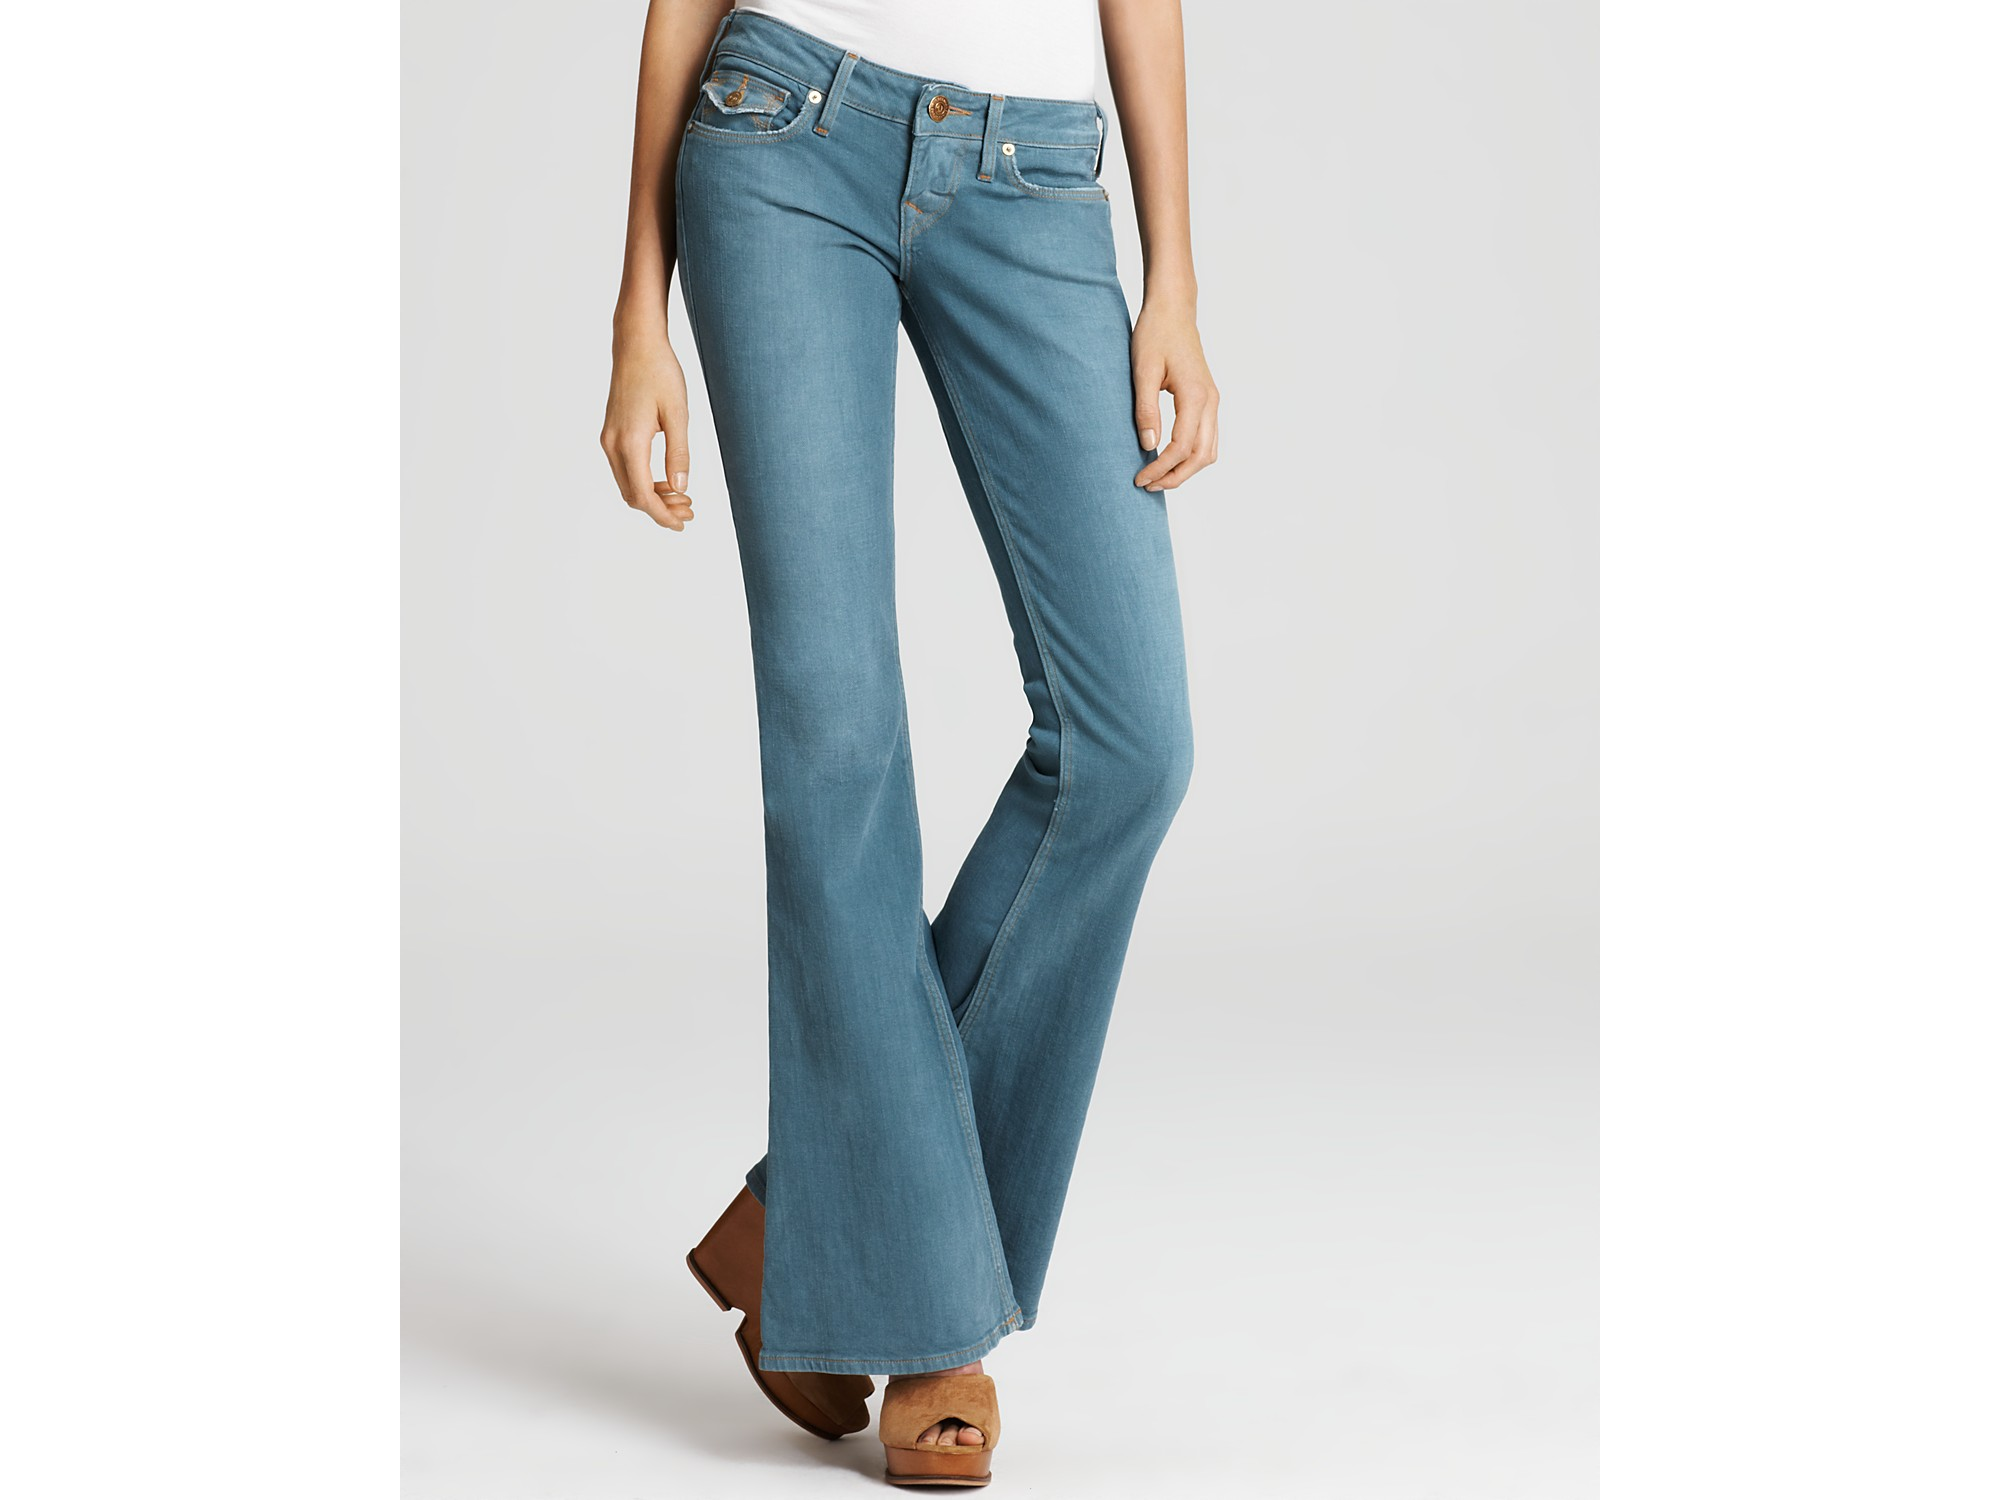 true religion jeans raegan flare jeans with lonestar. Black Bedroom Furniture Sets. Home Design Ideas